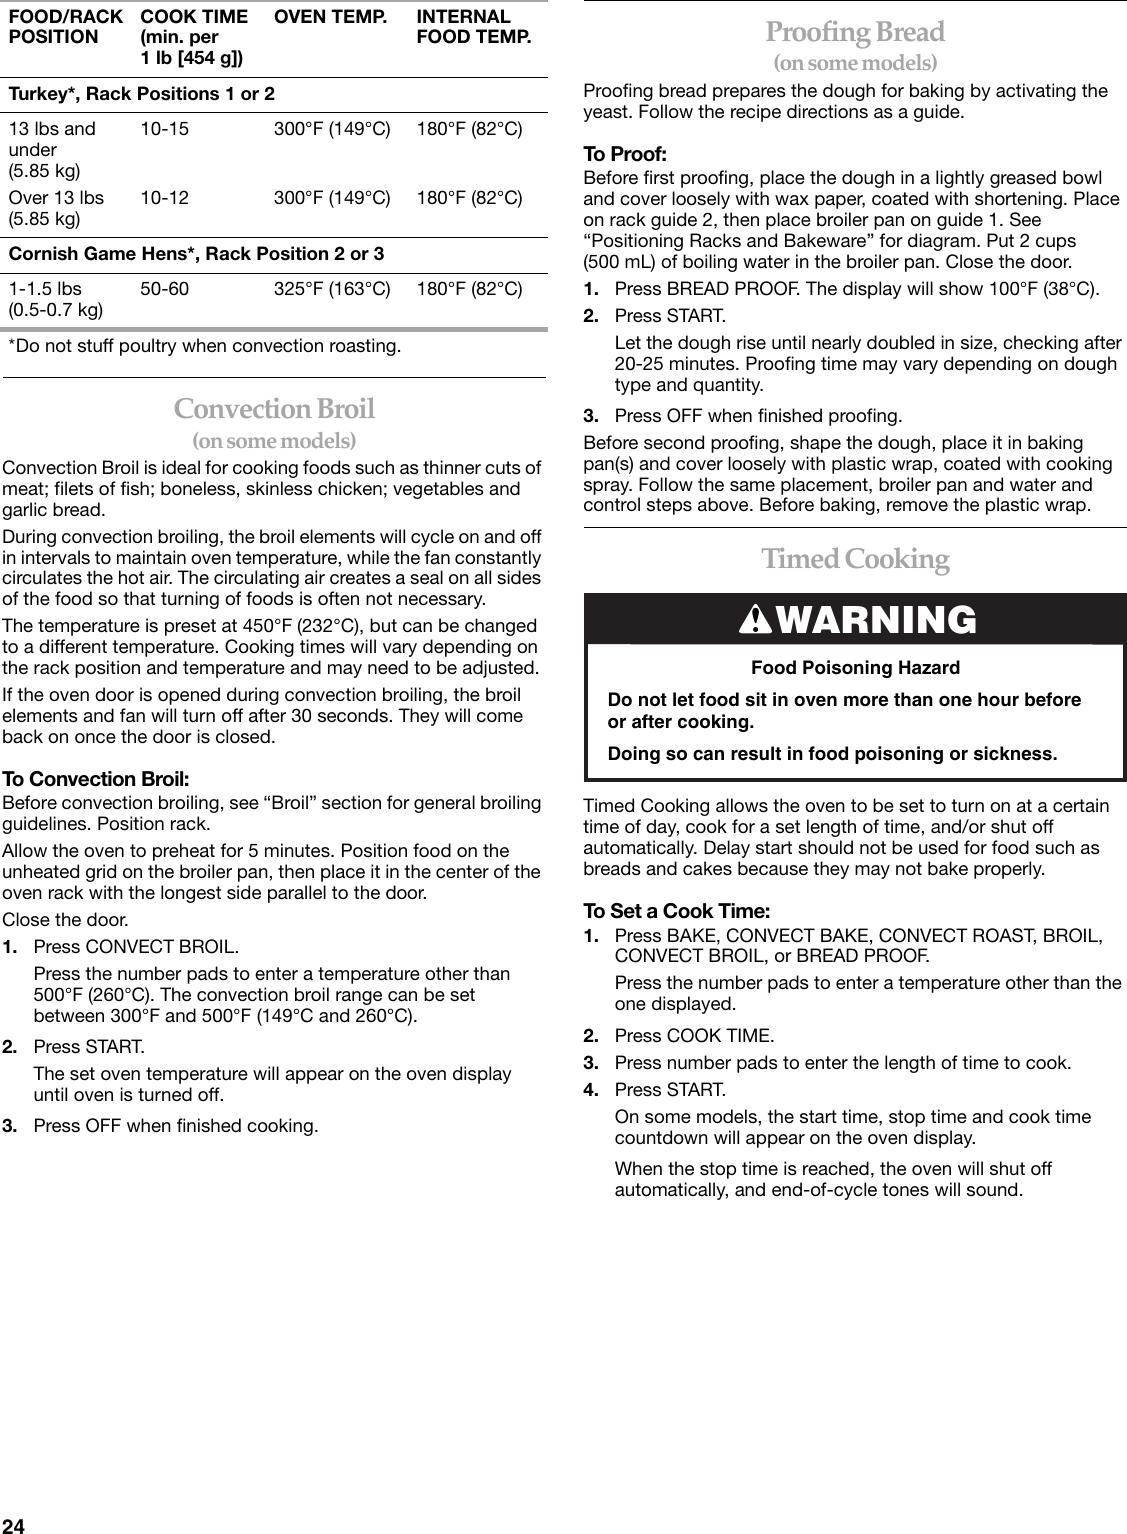 KitchenAid KESS908SPS Kitchen Aid Use And Care Manual User